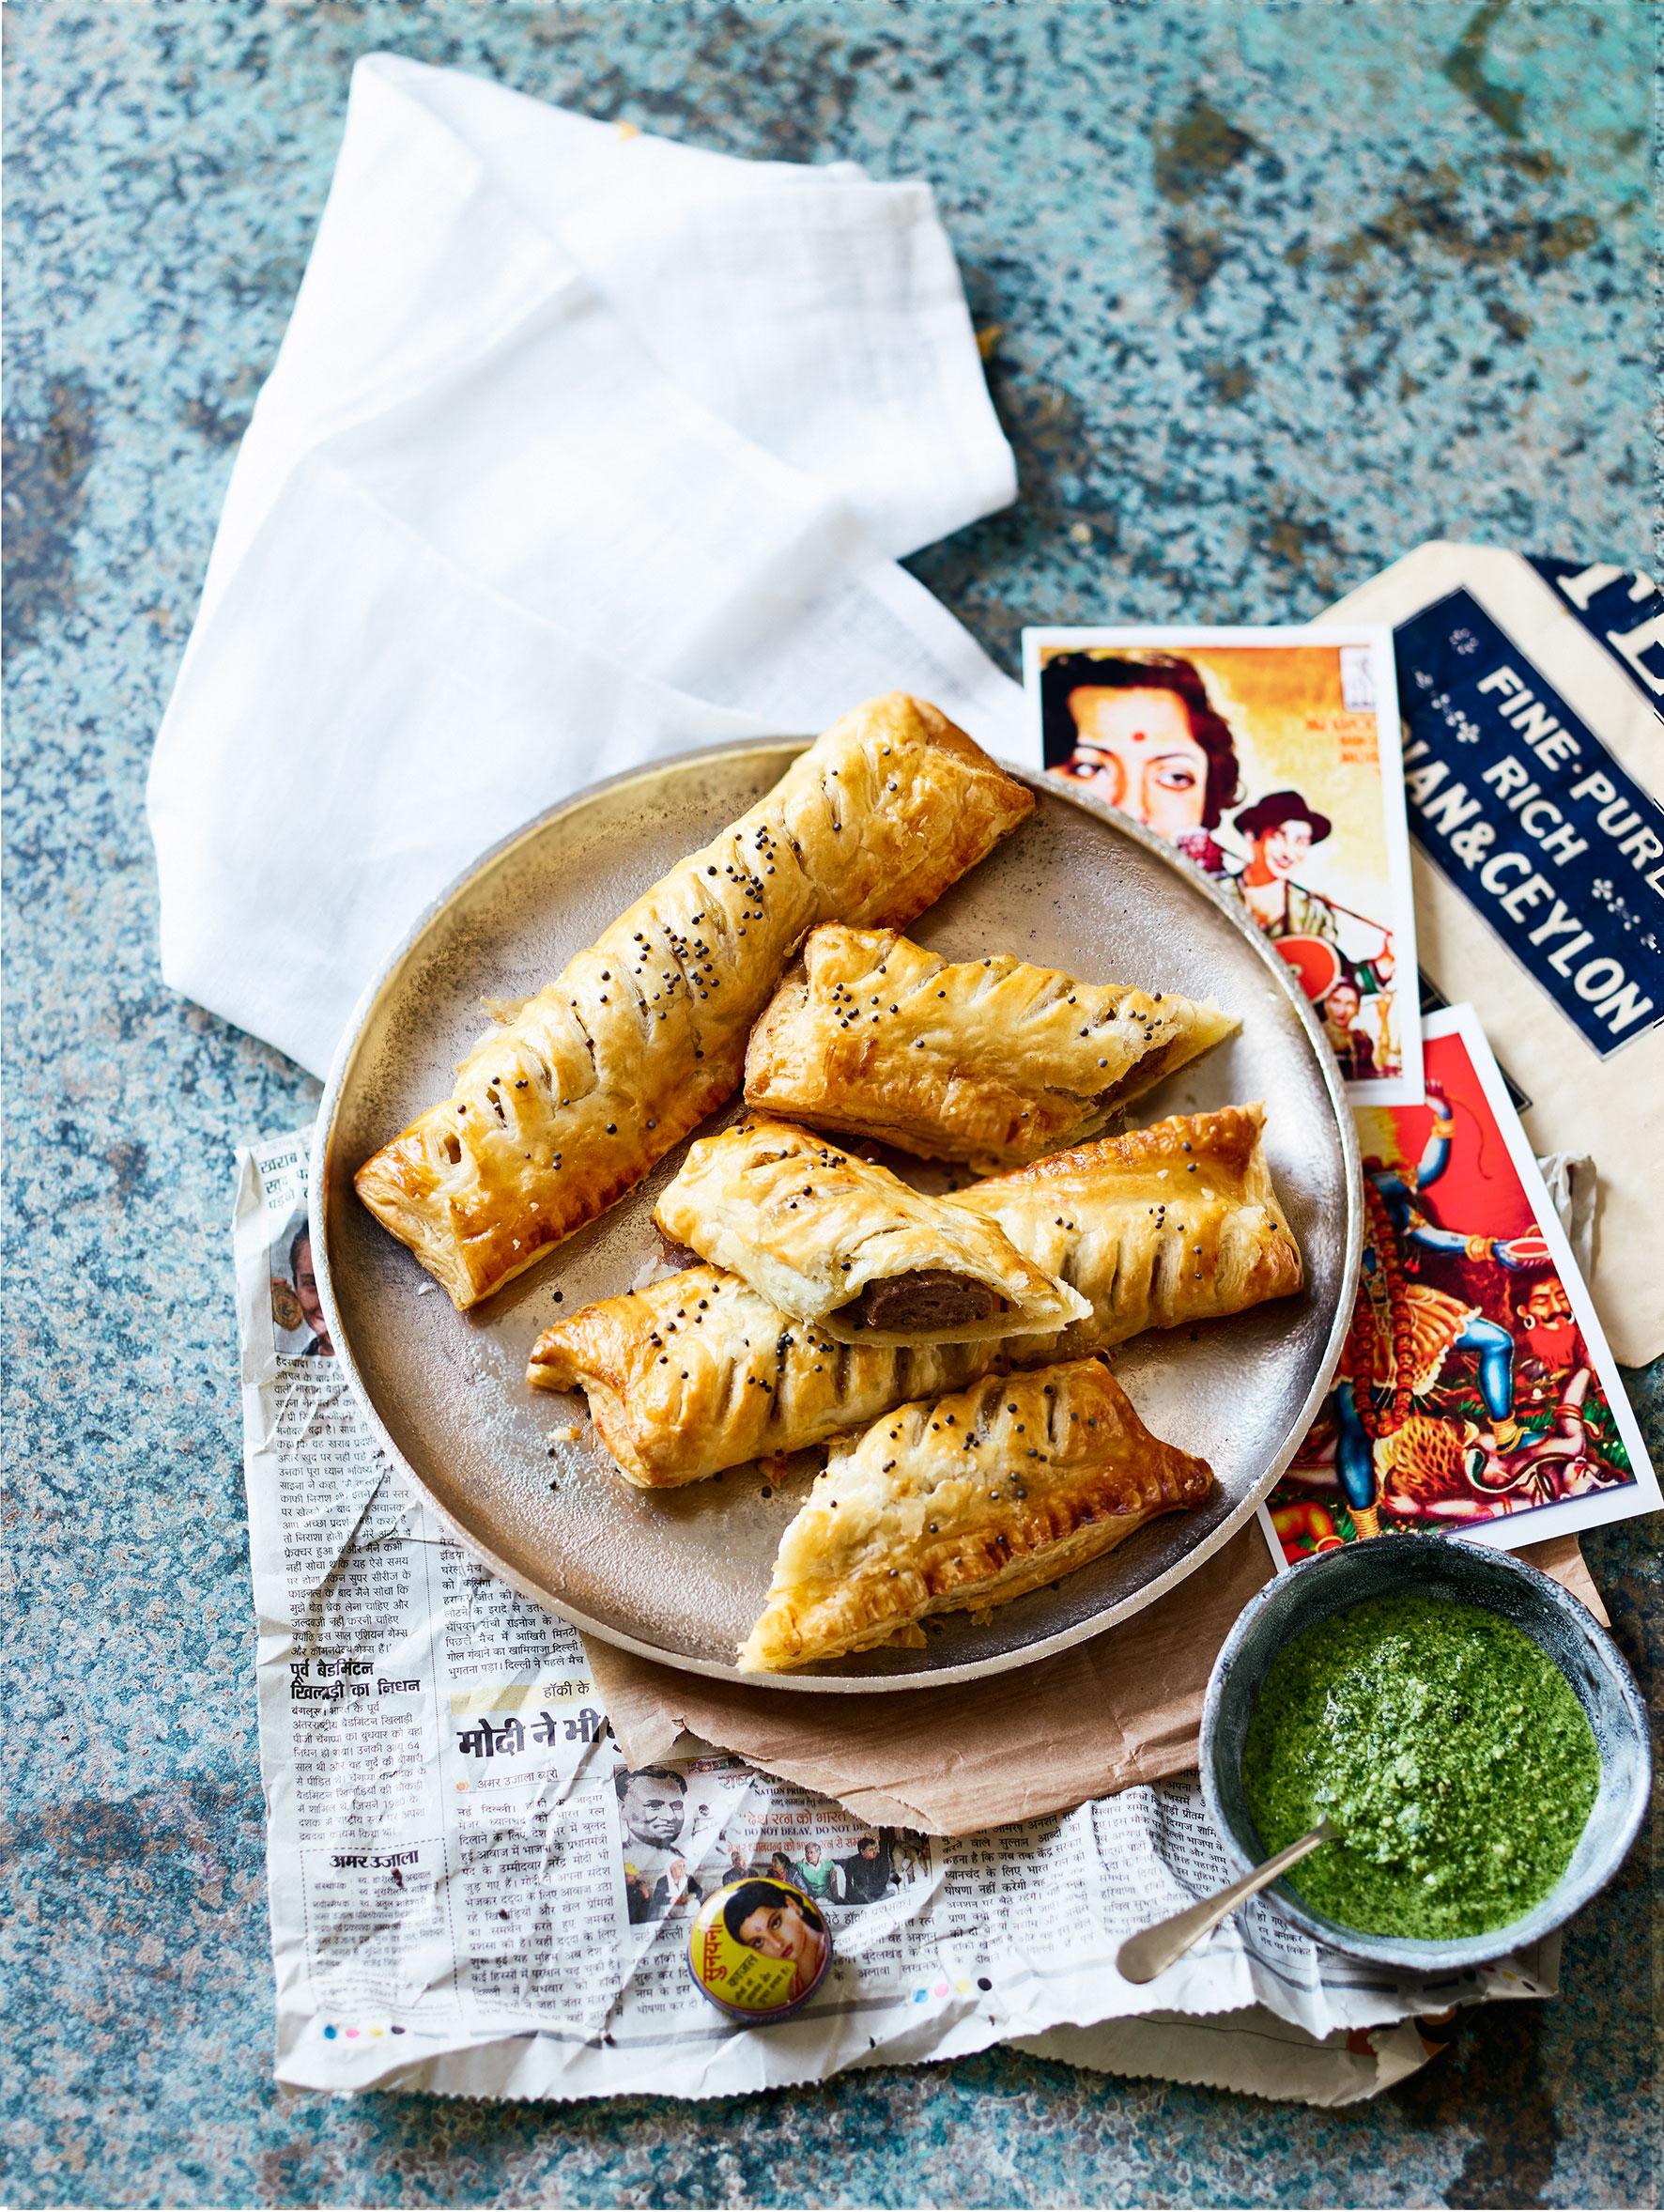 Rajasthani sausage rolls